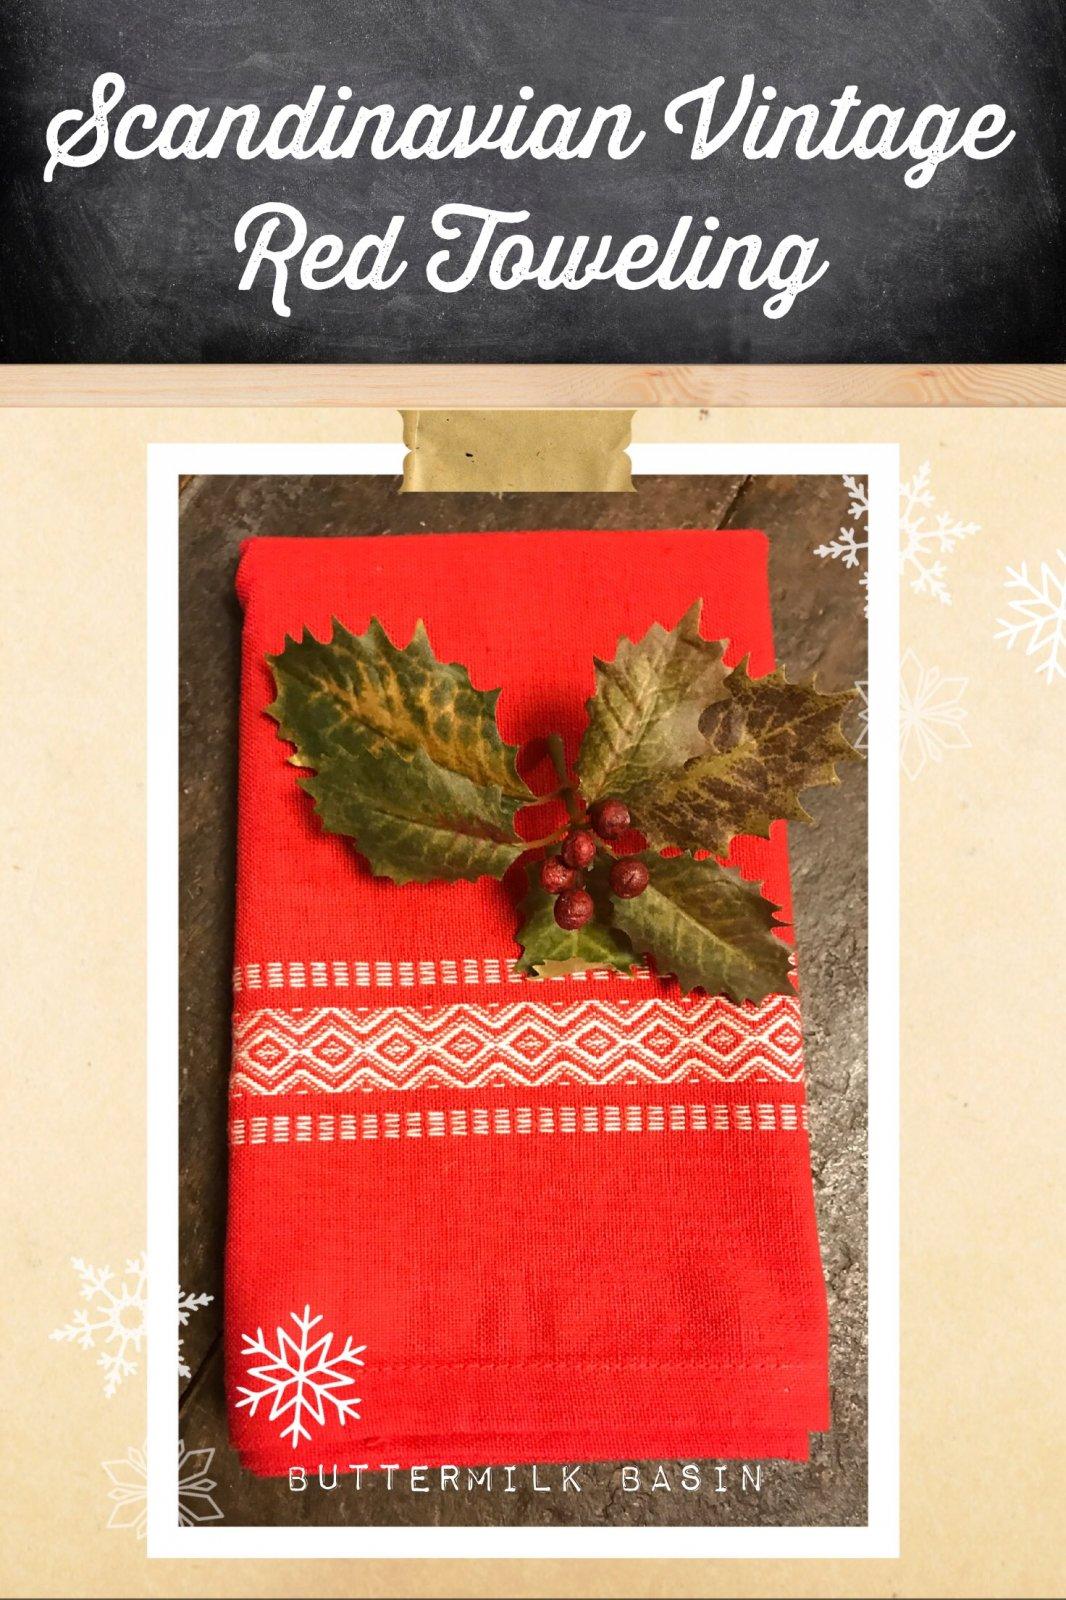 Scandinavian Vintage Red Toweling